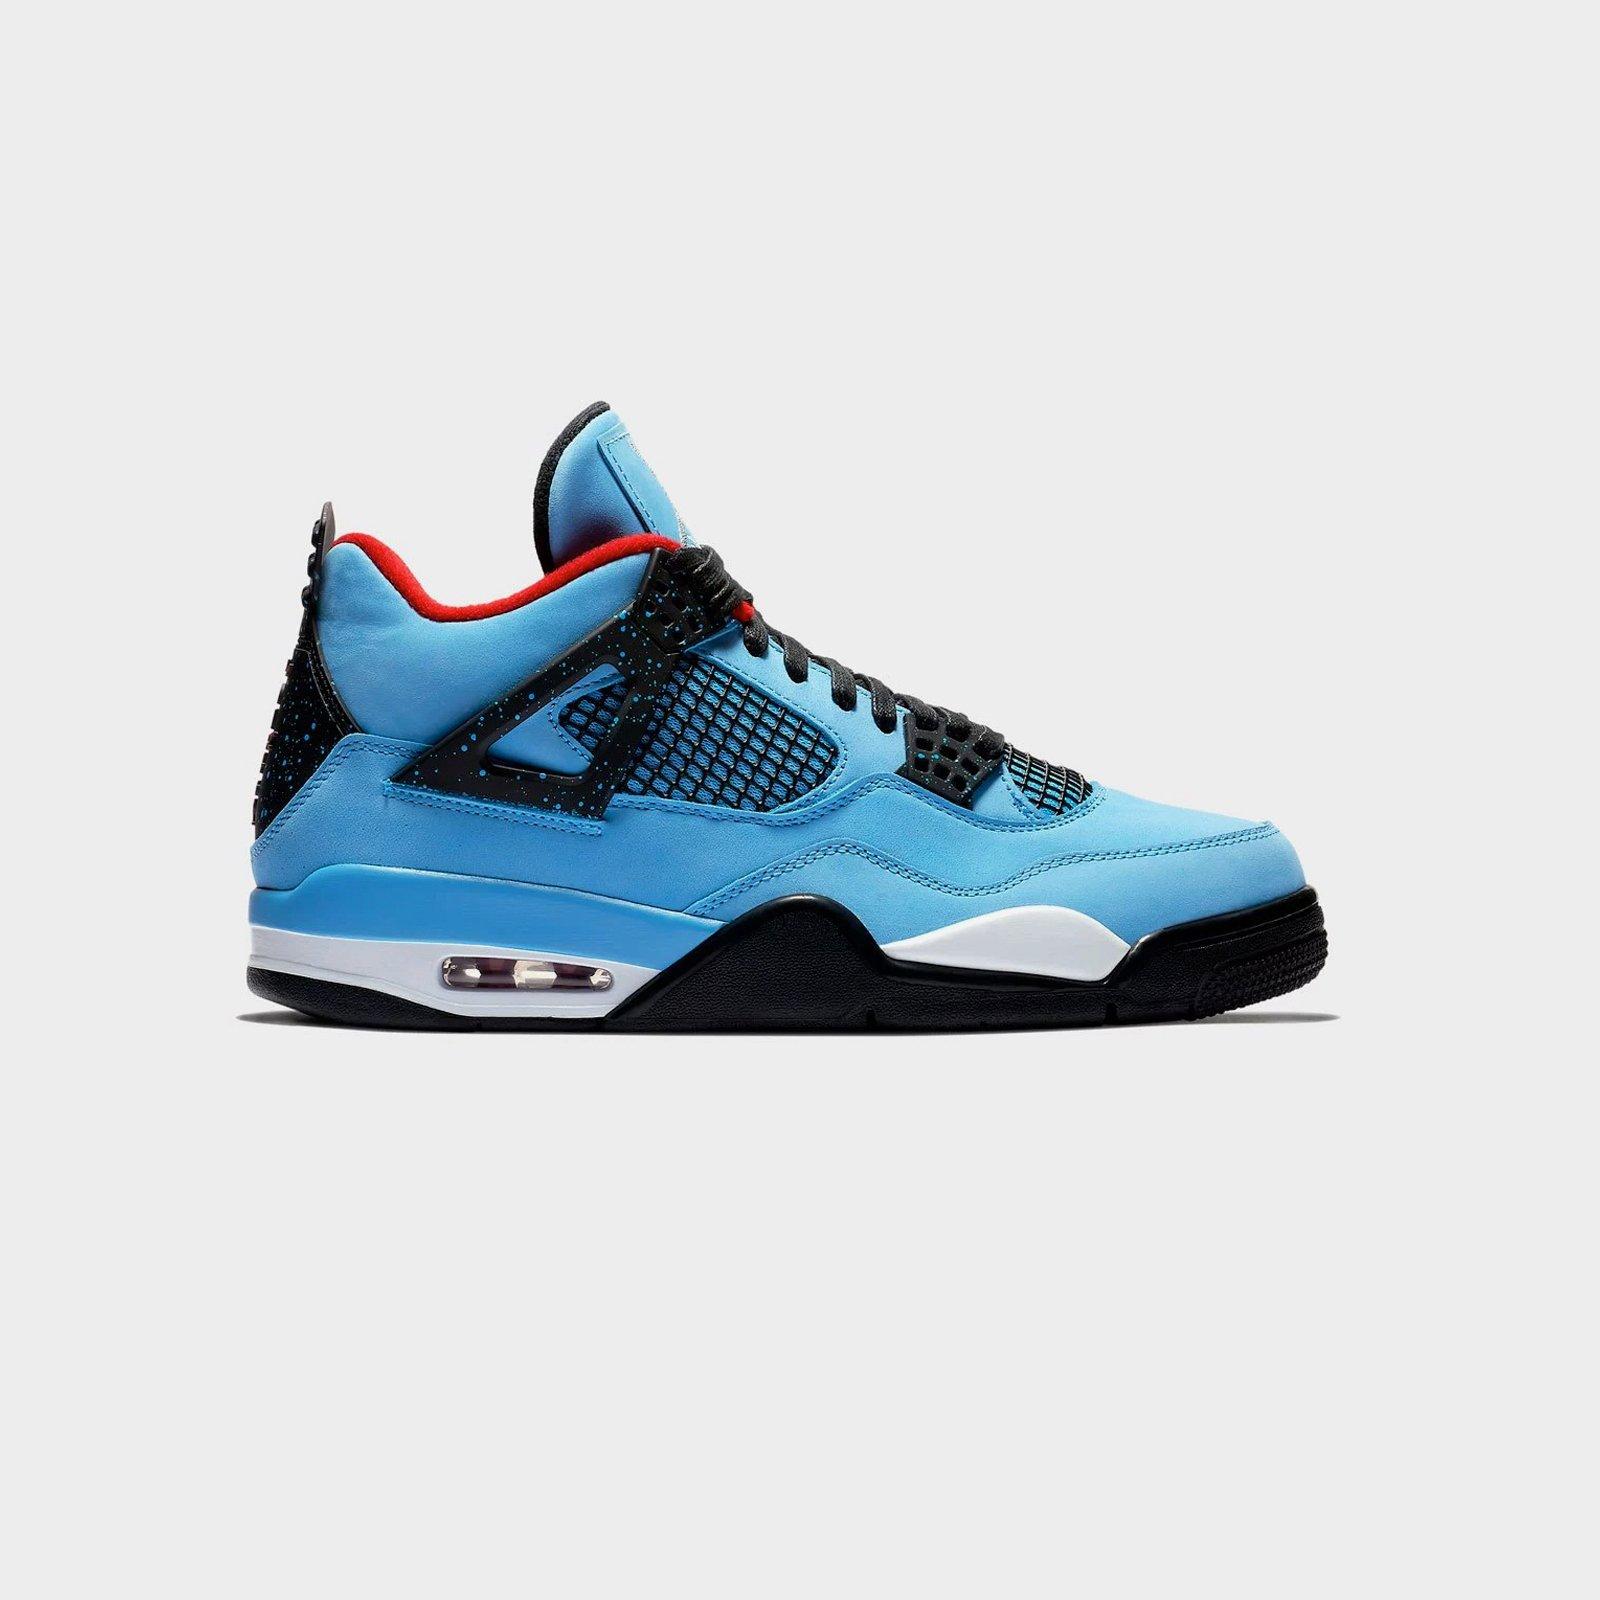 Jordan Brand Air Jordan 4 Retro - 308497-406 - Sneakersnstuff ... 3db2d26c4